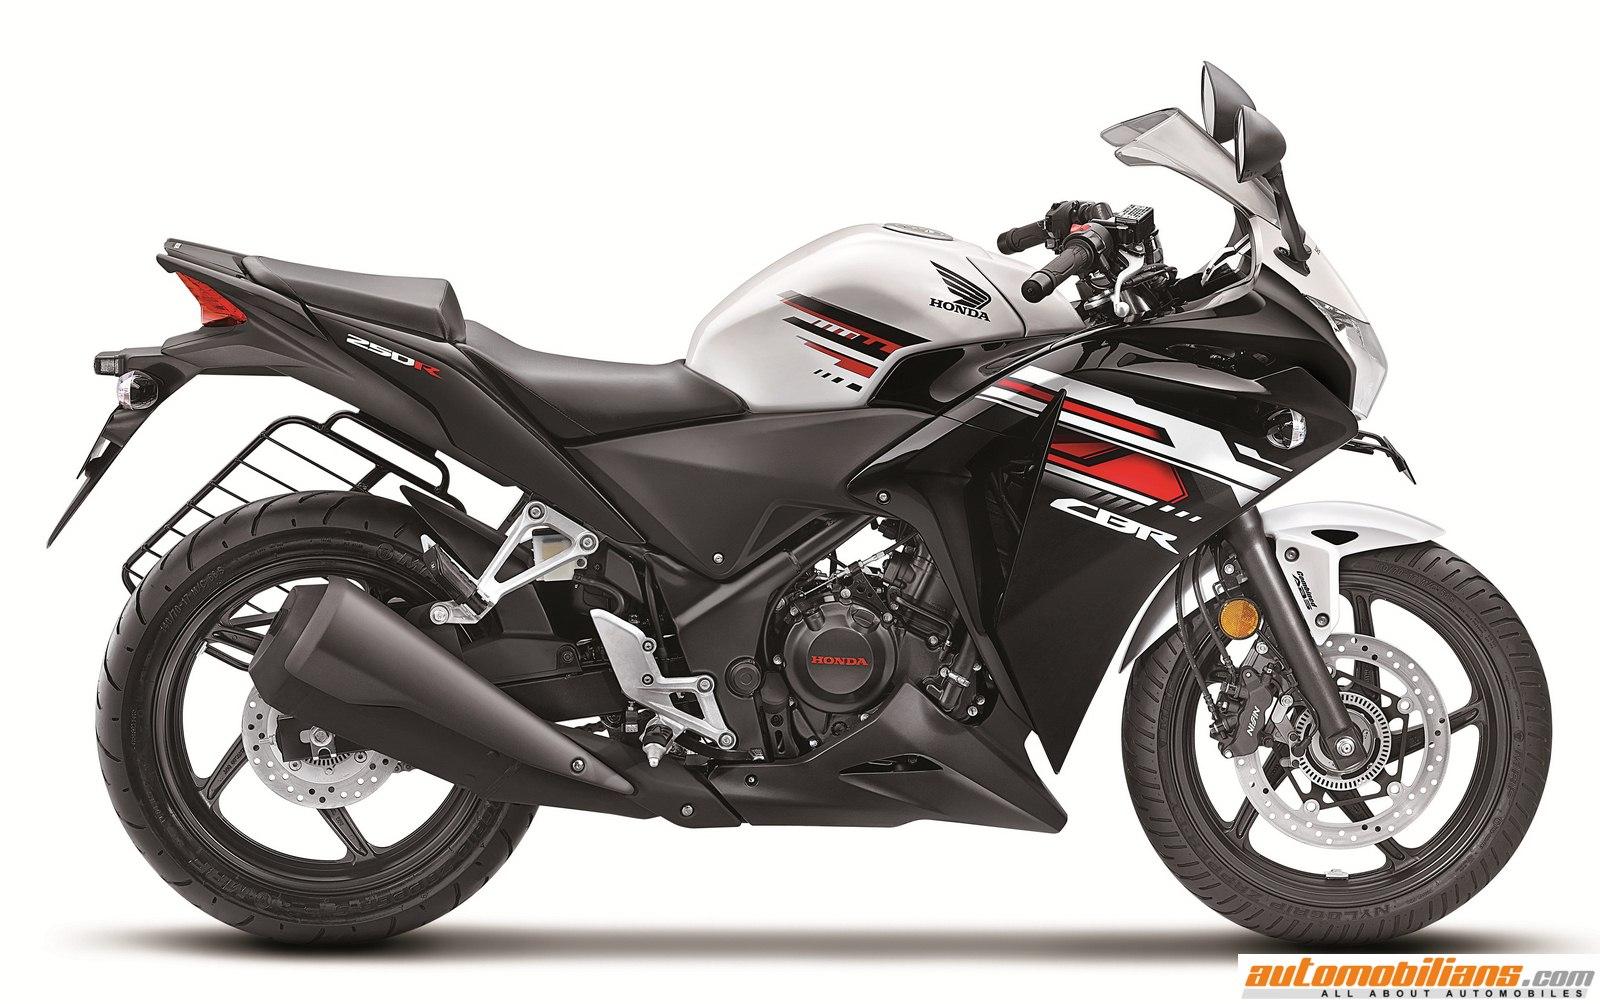 Bike stickers design for cbr 150 - New Honda Cbr 150r 250r Launch Automobilians 1